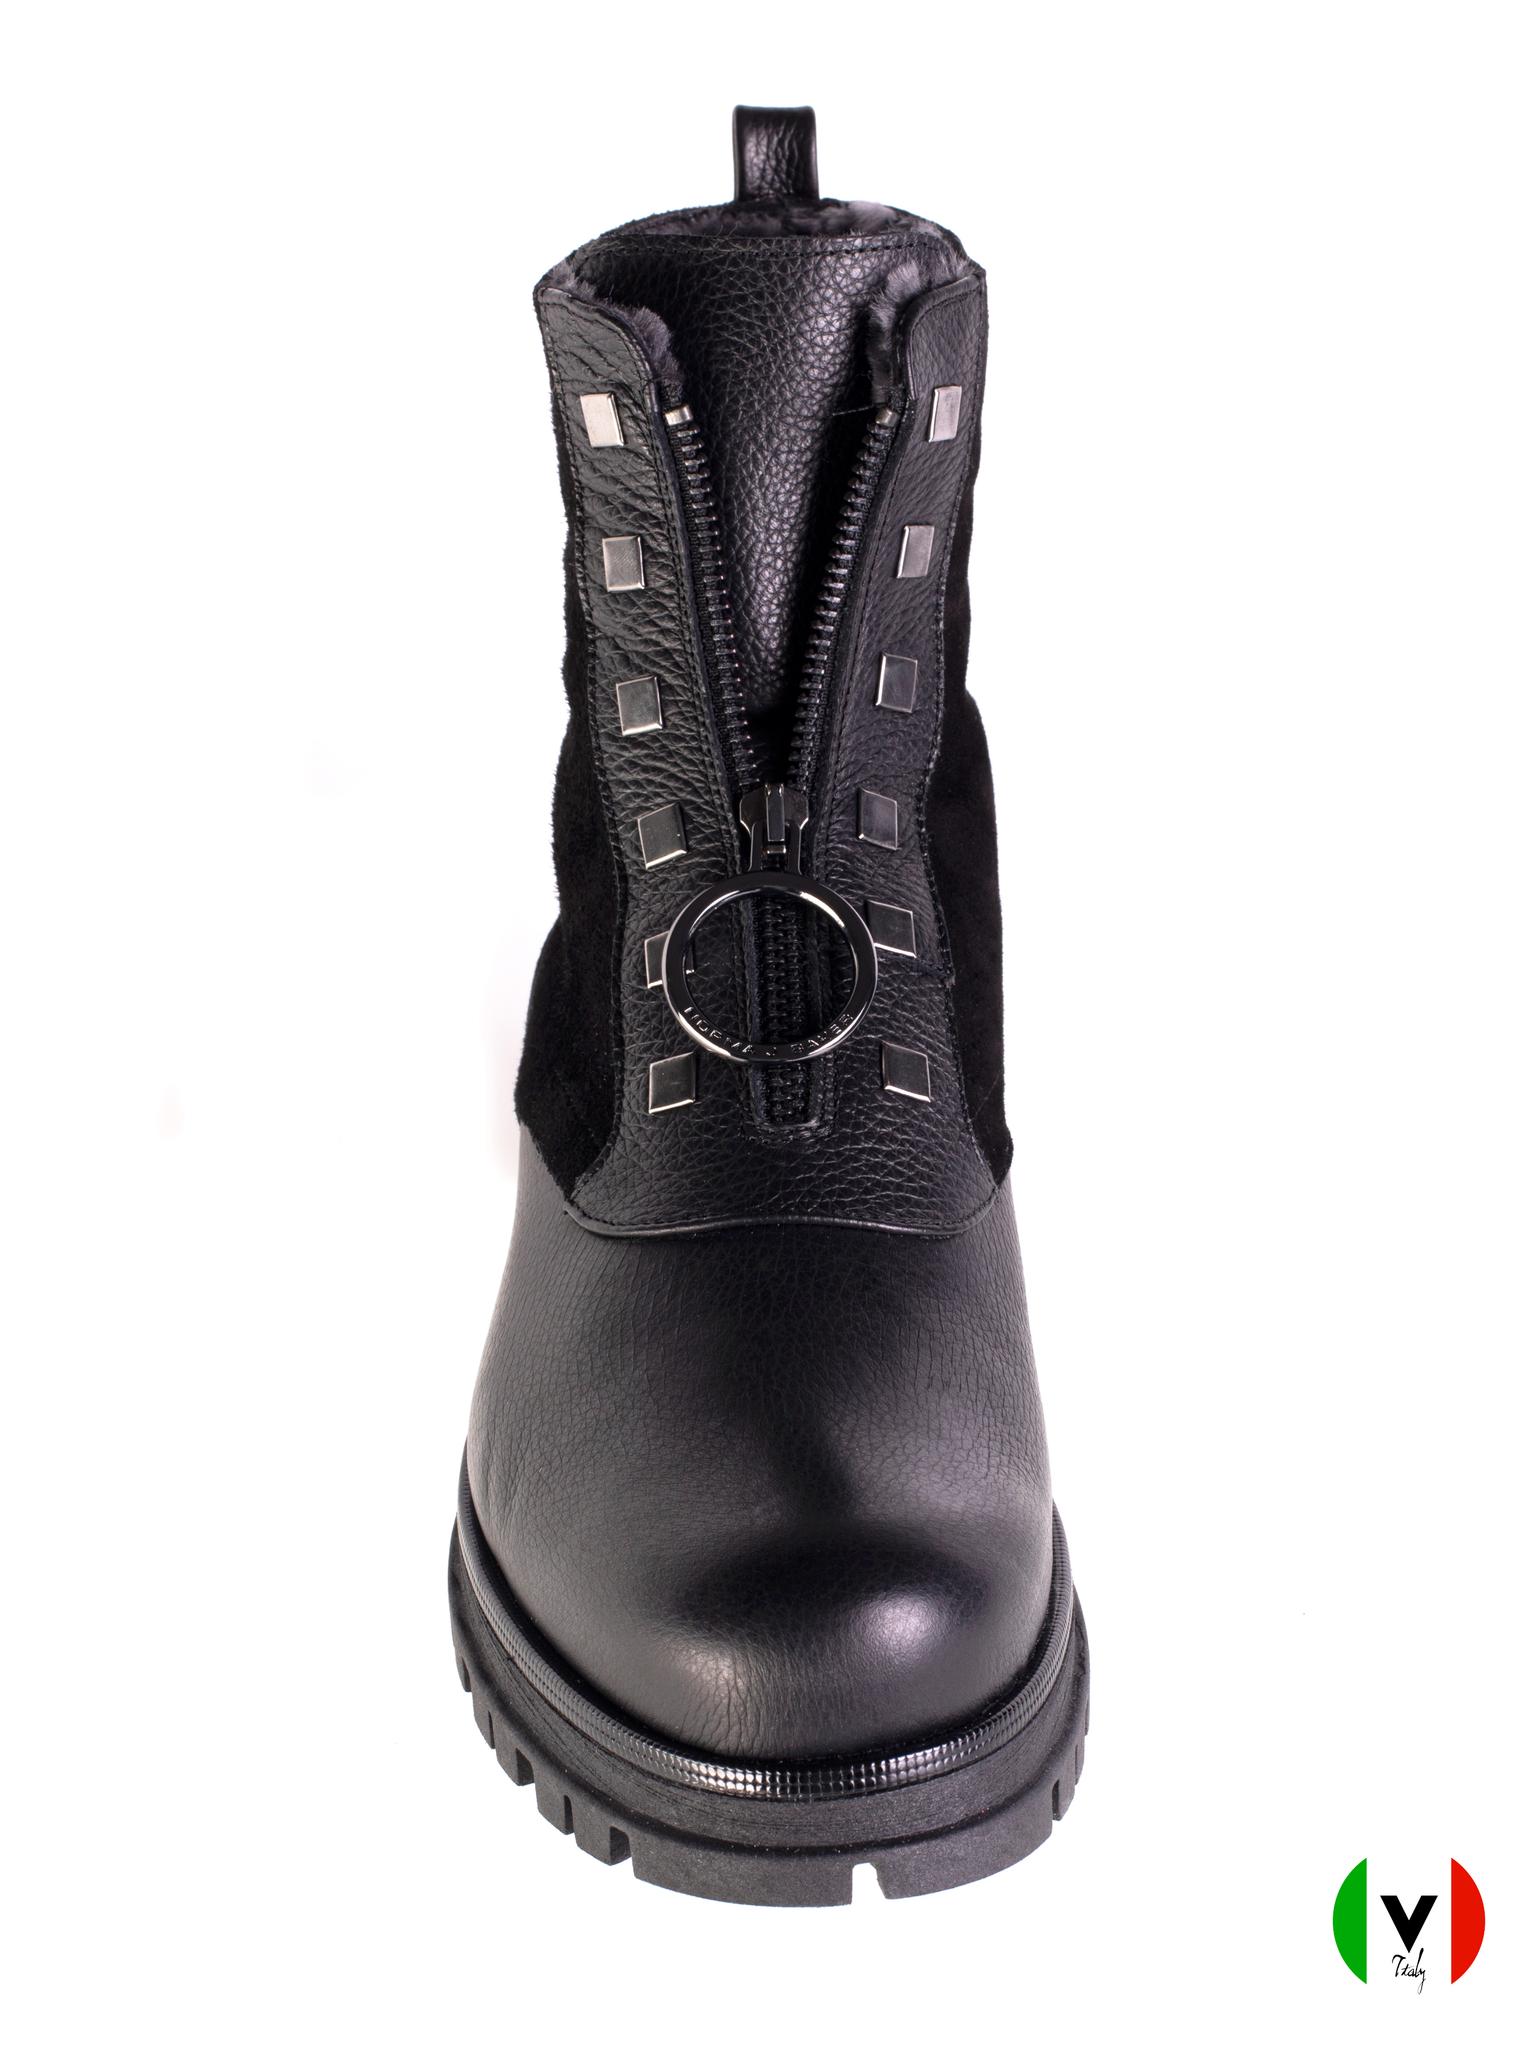 Зимние ботинки Norma J. Baker из кожи и замши 7427, артикул 7427, сезон зима, цвет чёрный, материал кожа, замша, цена 19 500 руб., veroitaly.ru